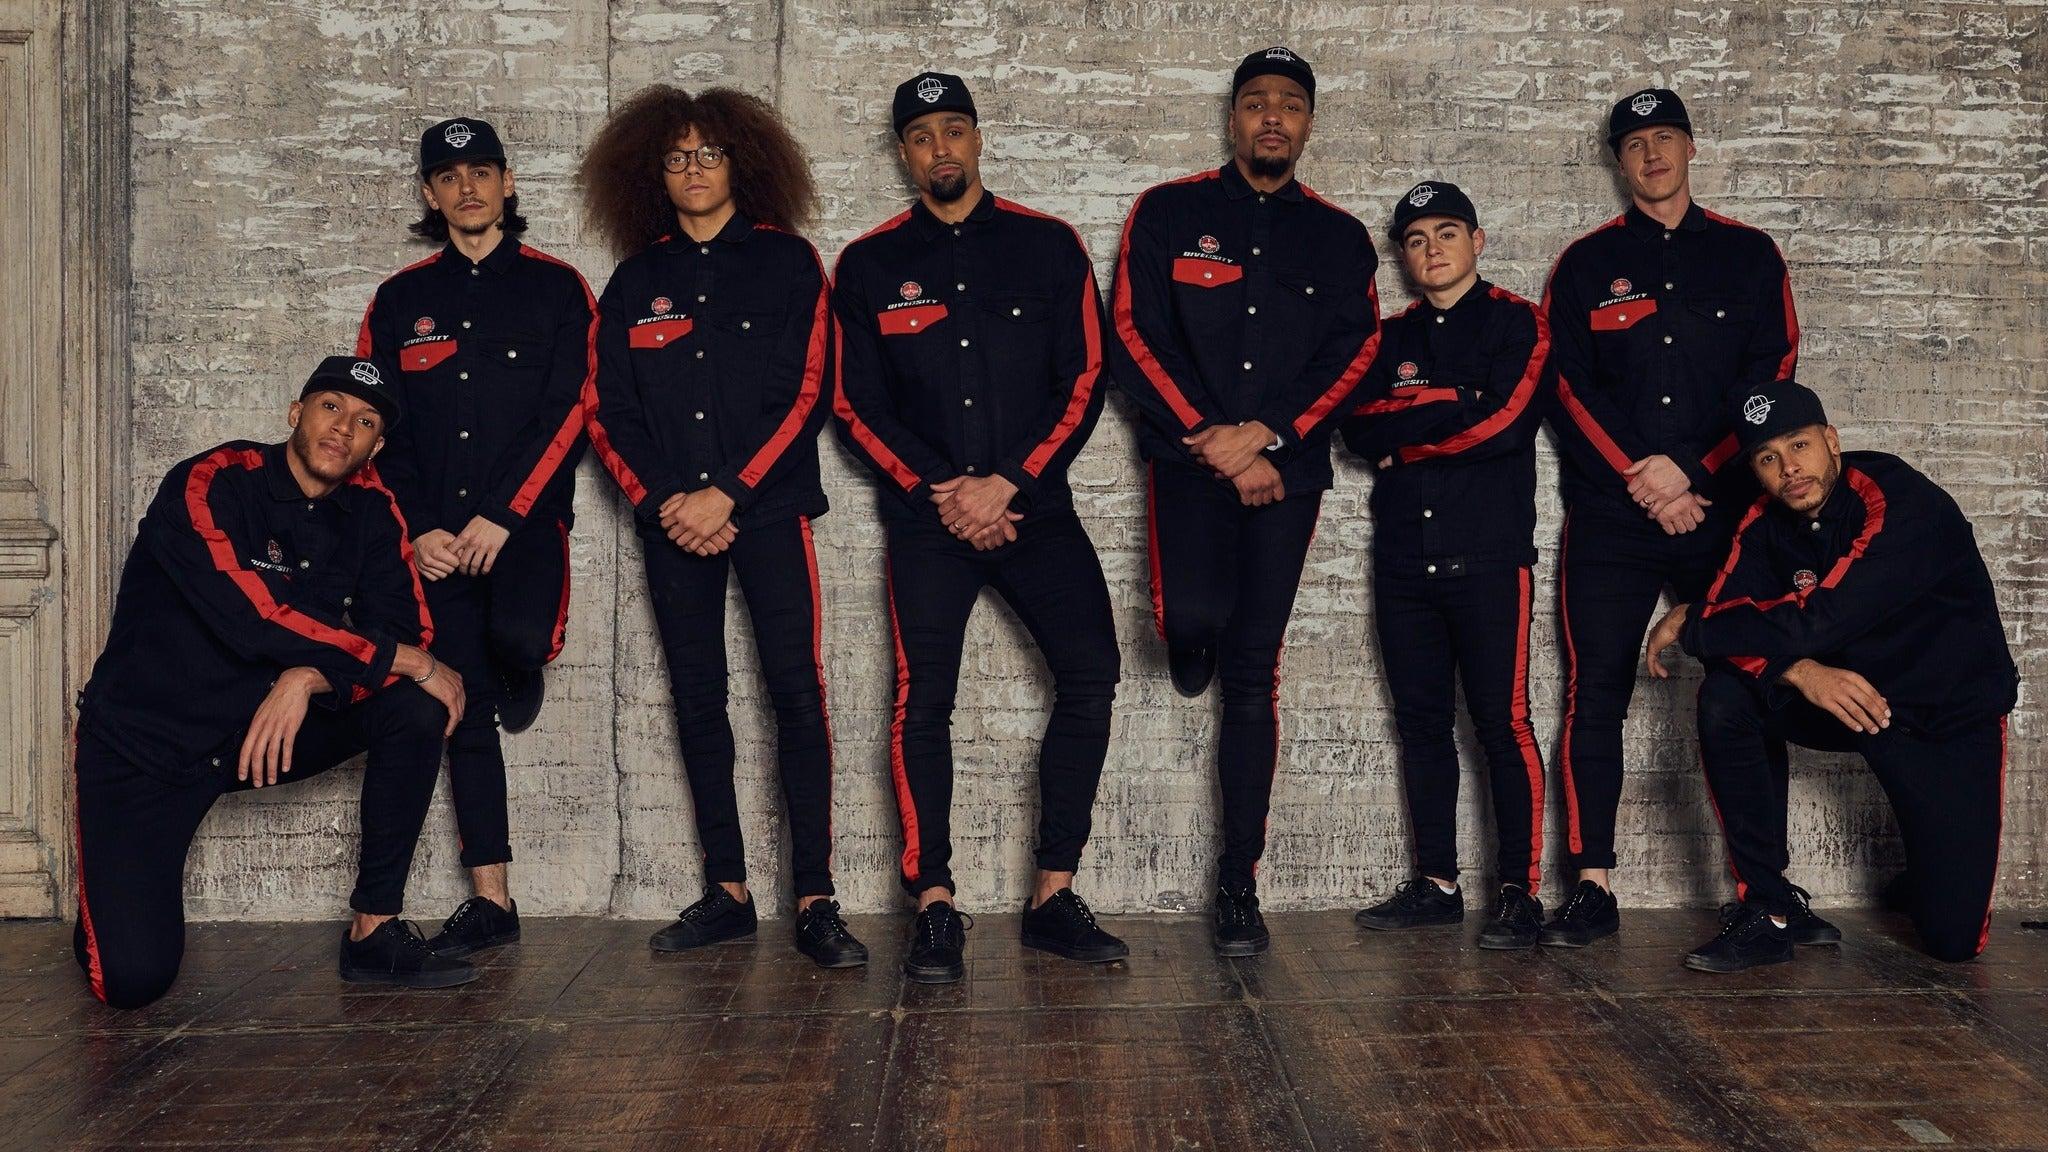 Diversity Born Ready the 10th Anniversary Tour